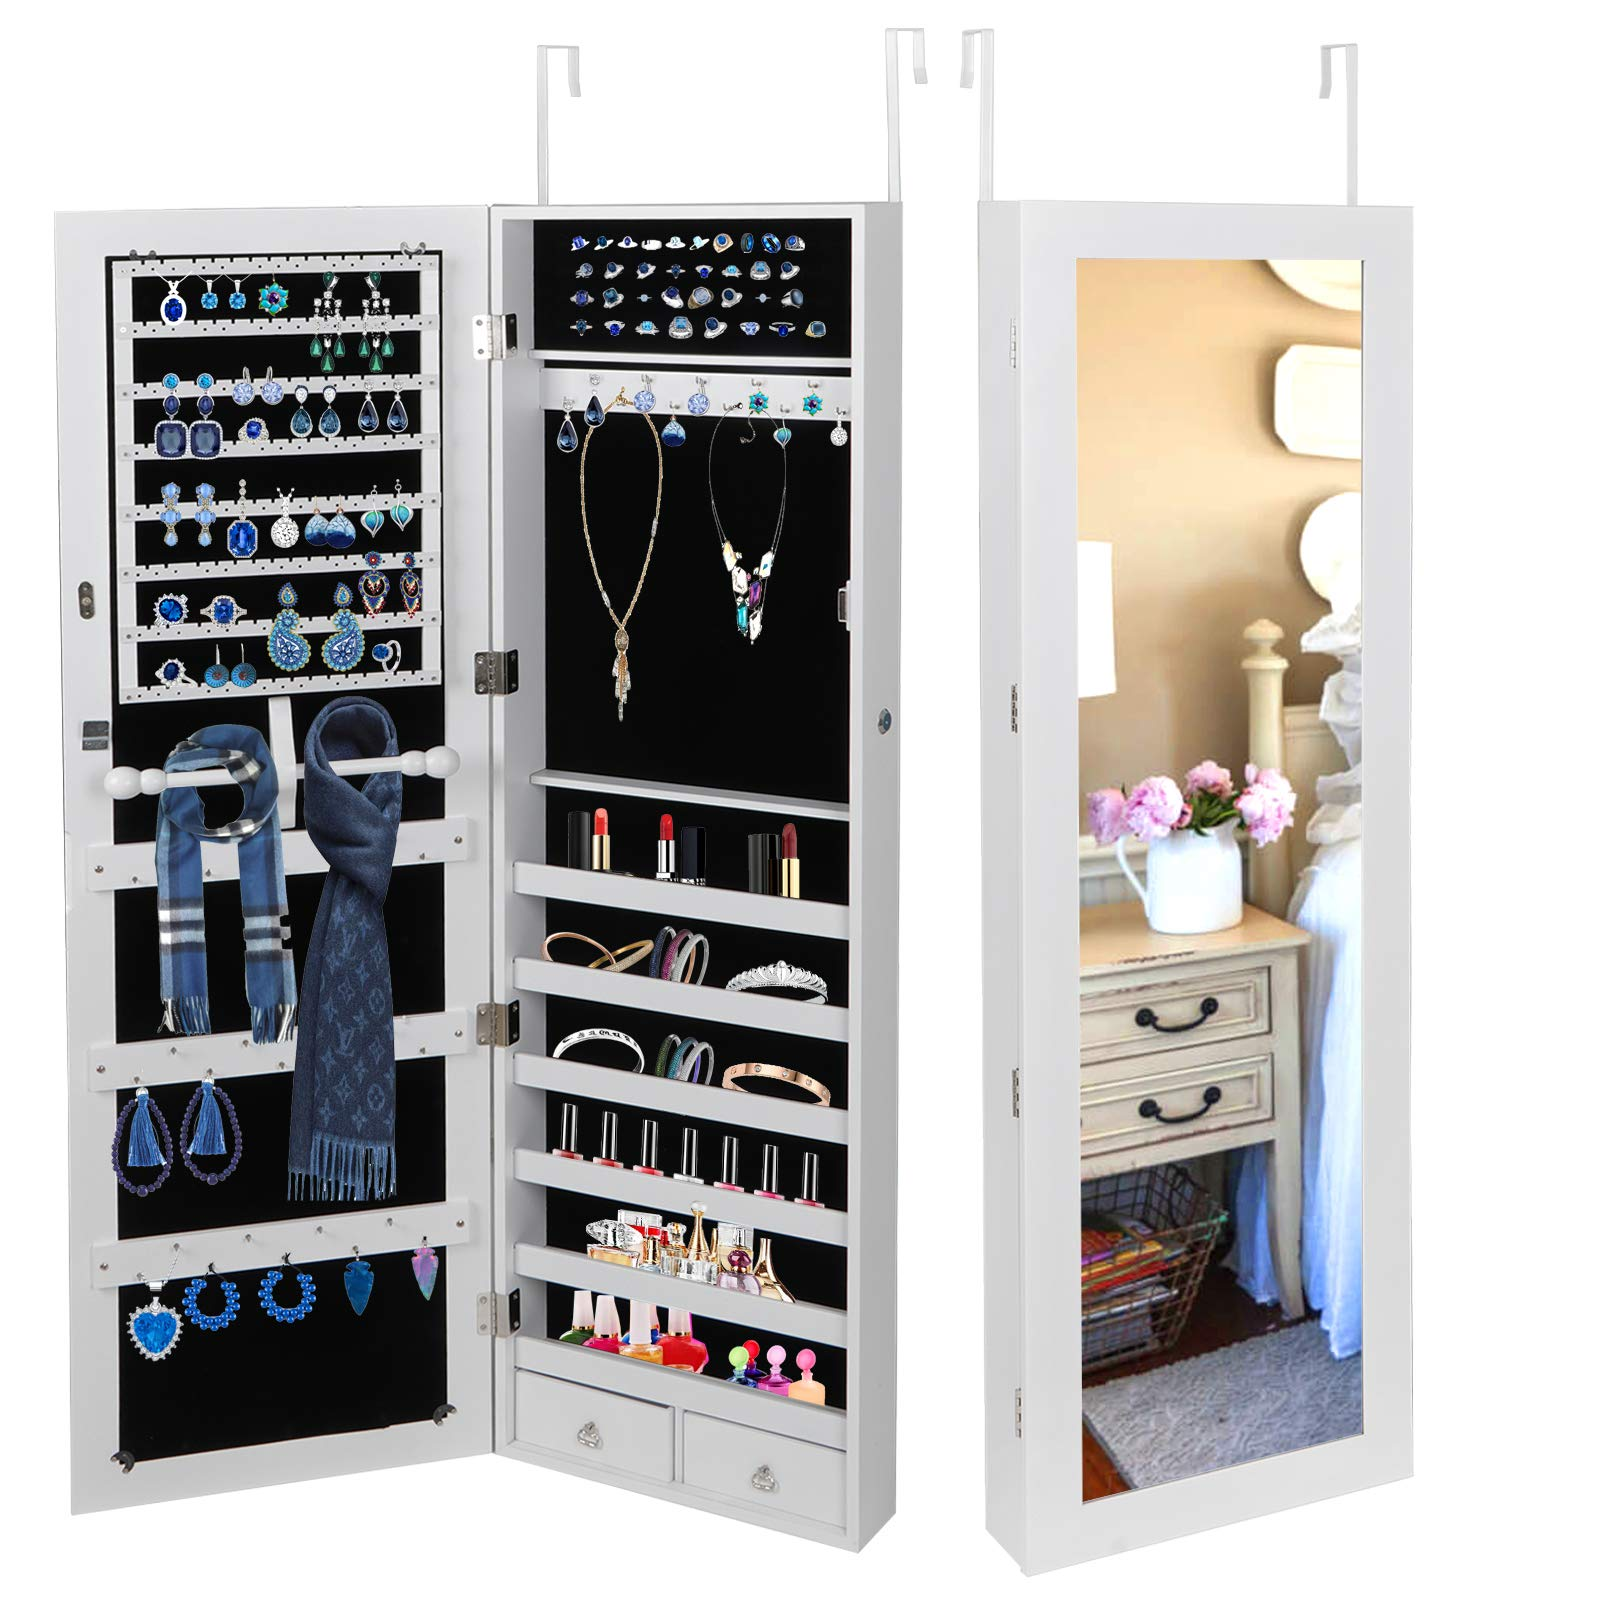 ZENY Lockable Jewelry Carbinet Armoire Mirrored Door Wall Mounted Jewelry Organizer Storage Box Large Capacity w/ 2 Drawers